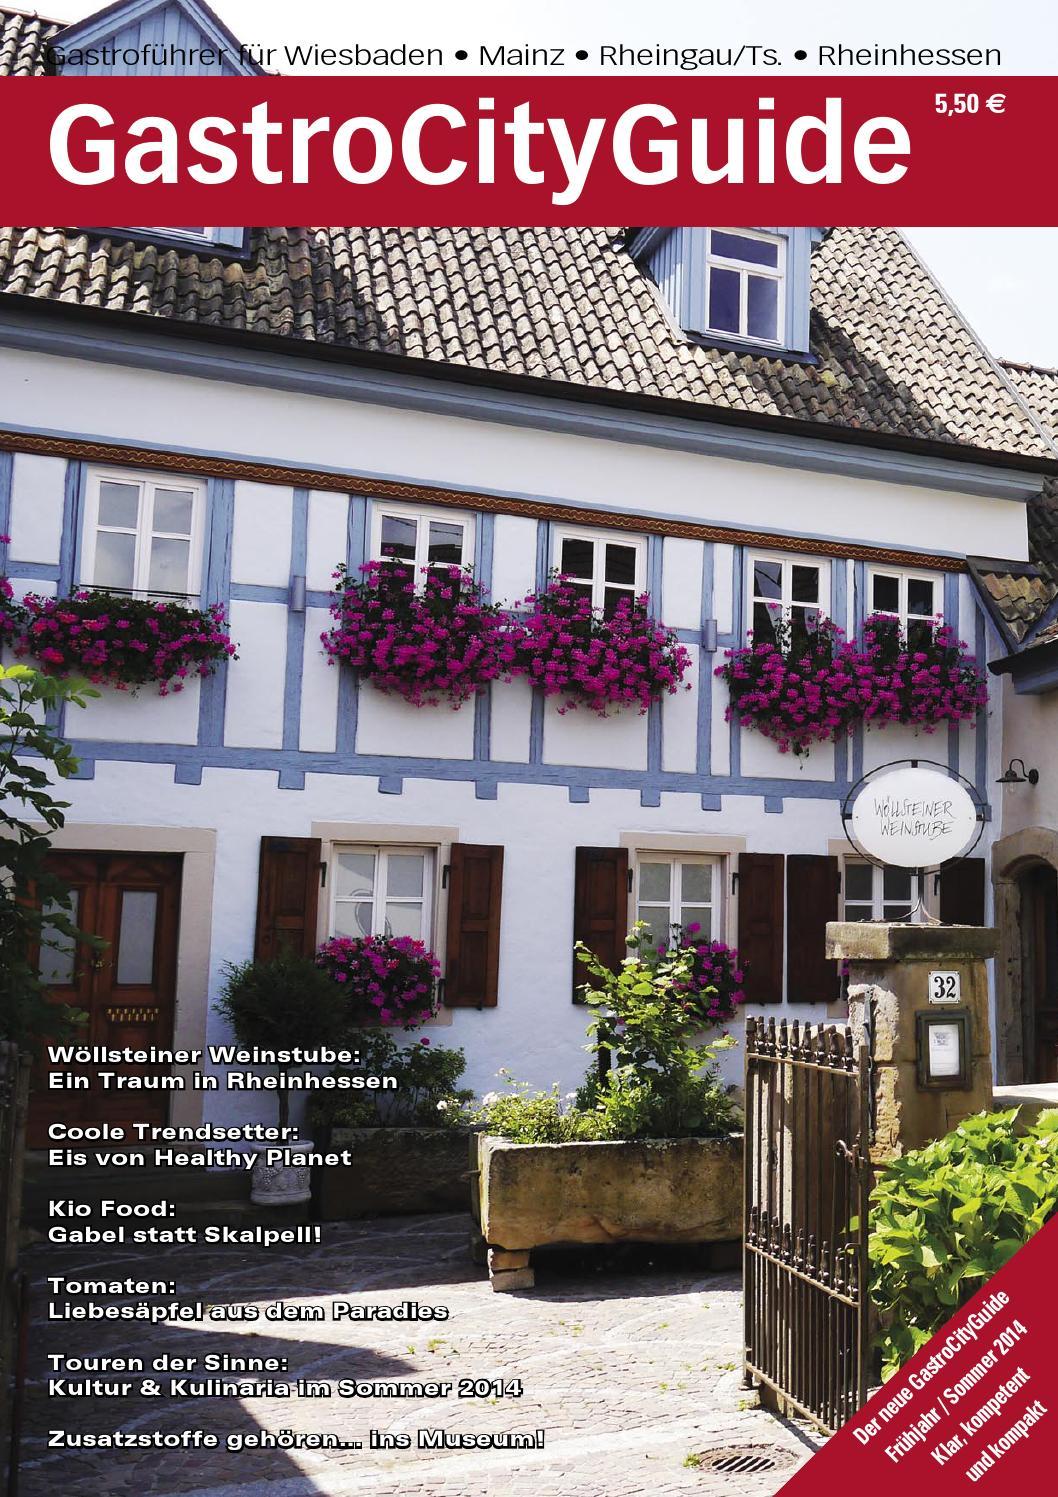 GastroCityGuide, Ausgabe 0114 by Petra Esser - issuu